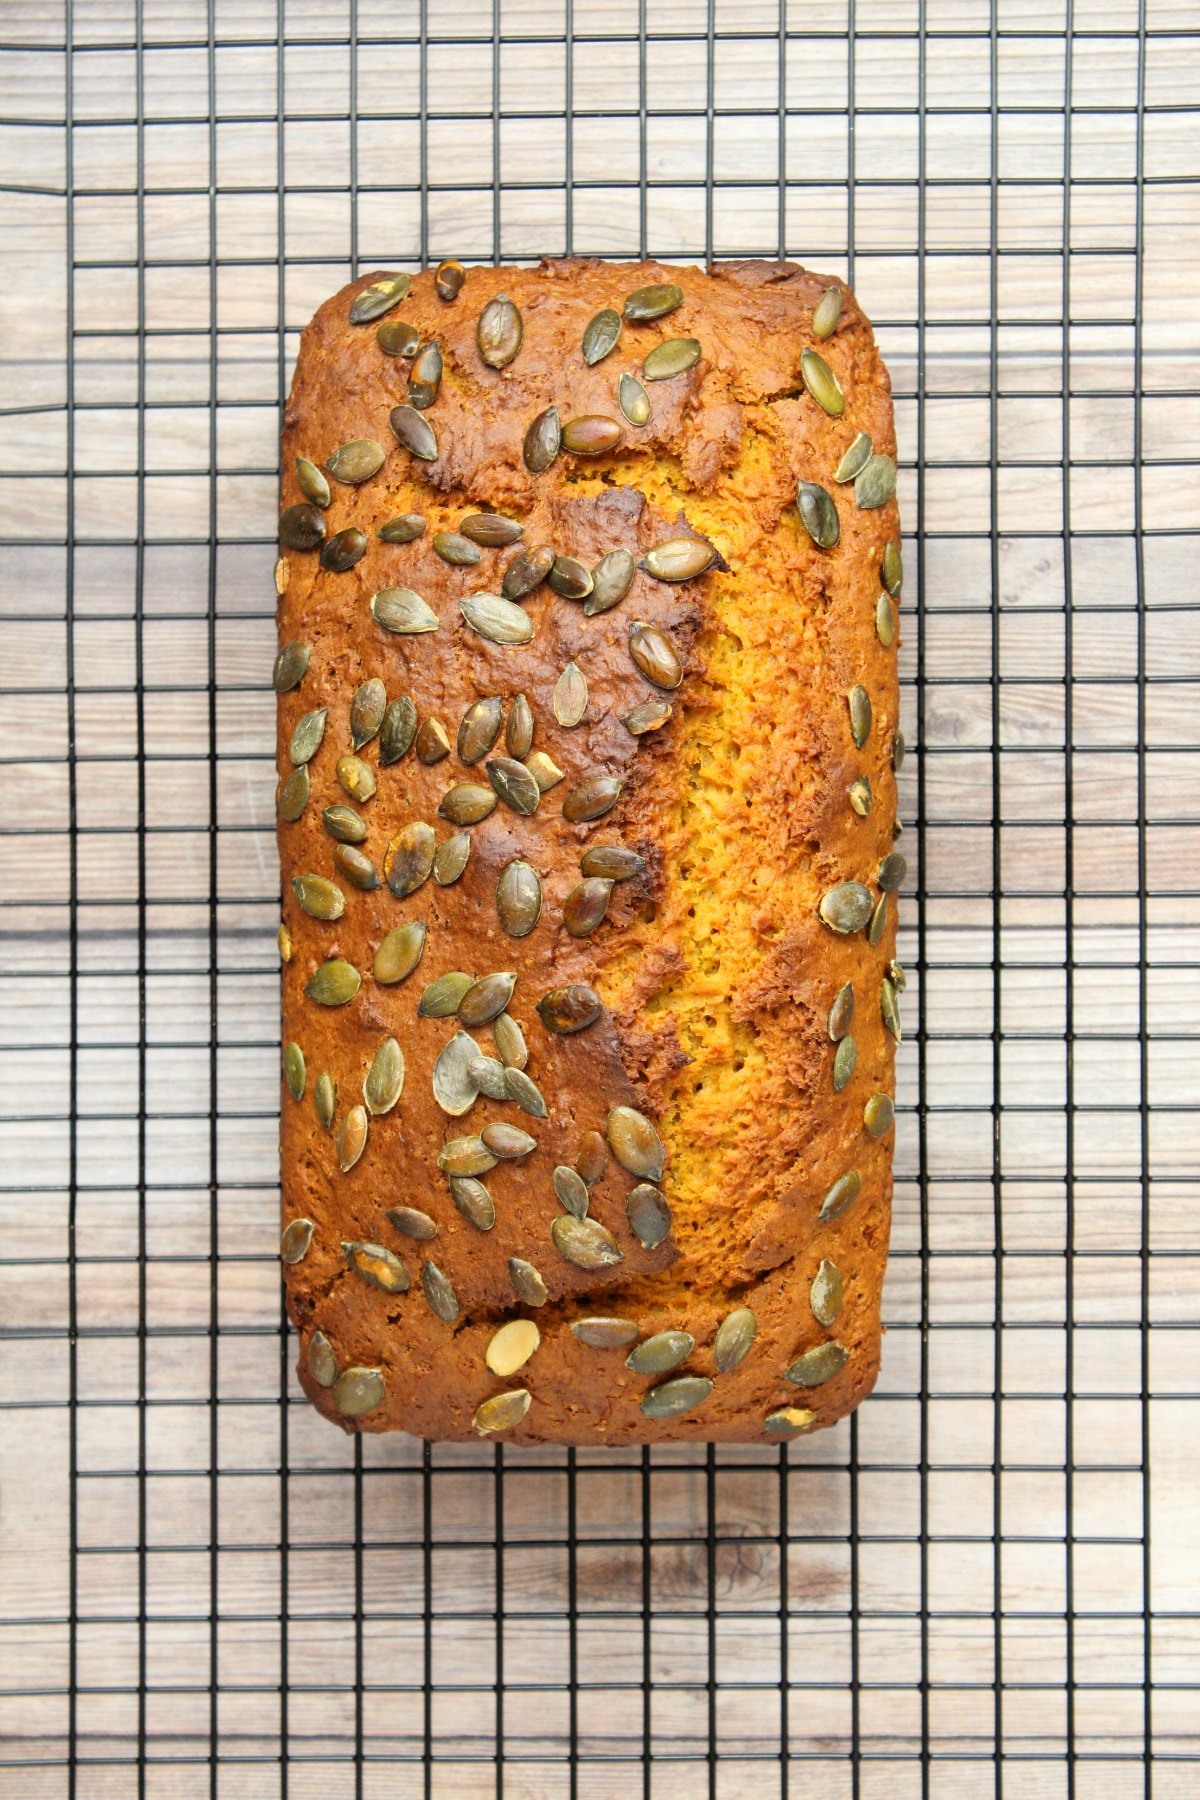 Loaf of vegan pumpkin bread on a wire cooling rack.